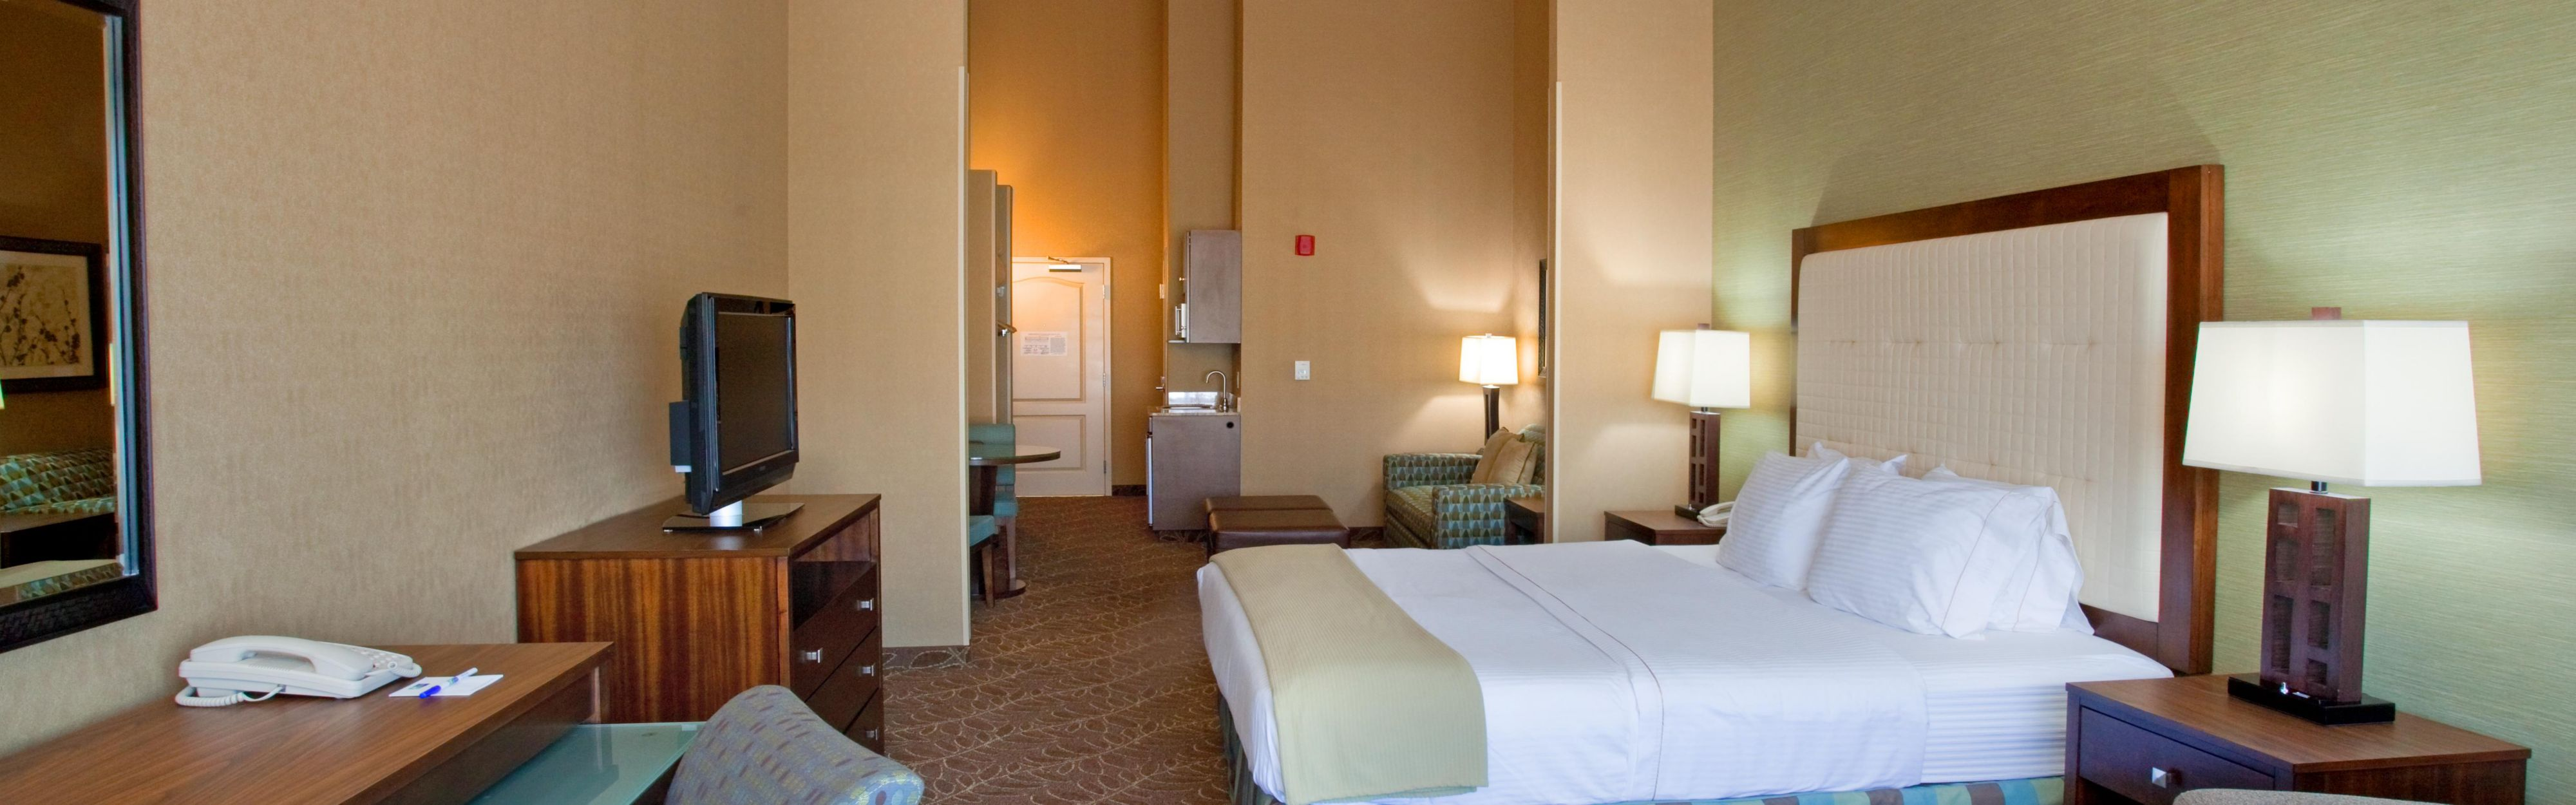 Holiday Inn Express & Suites Logan image 1